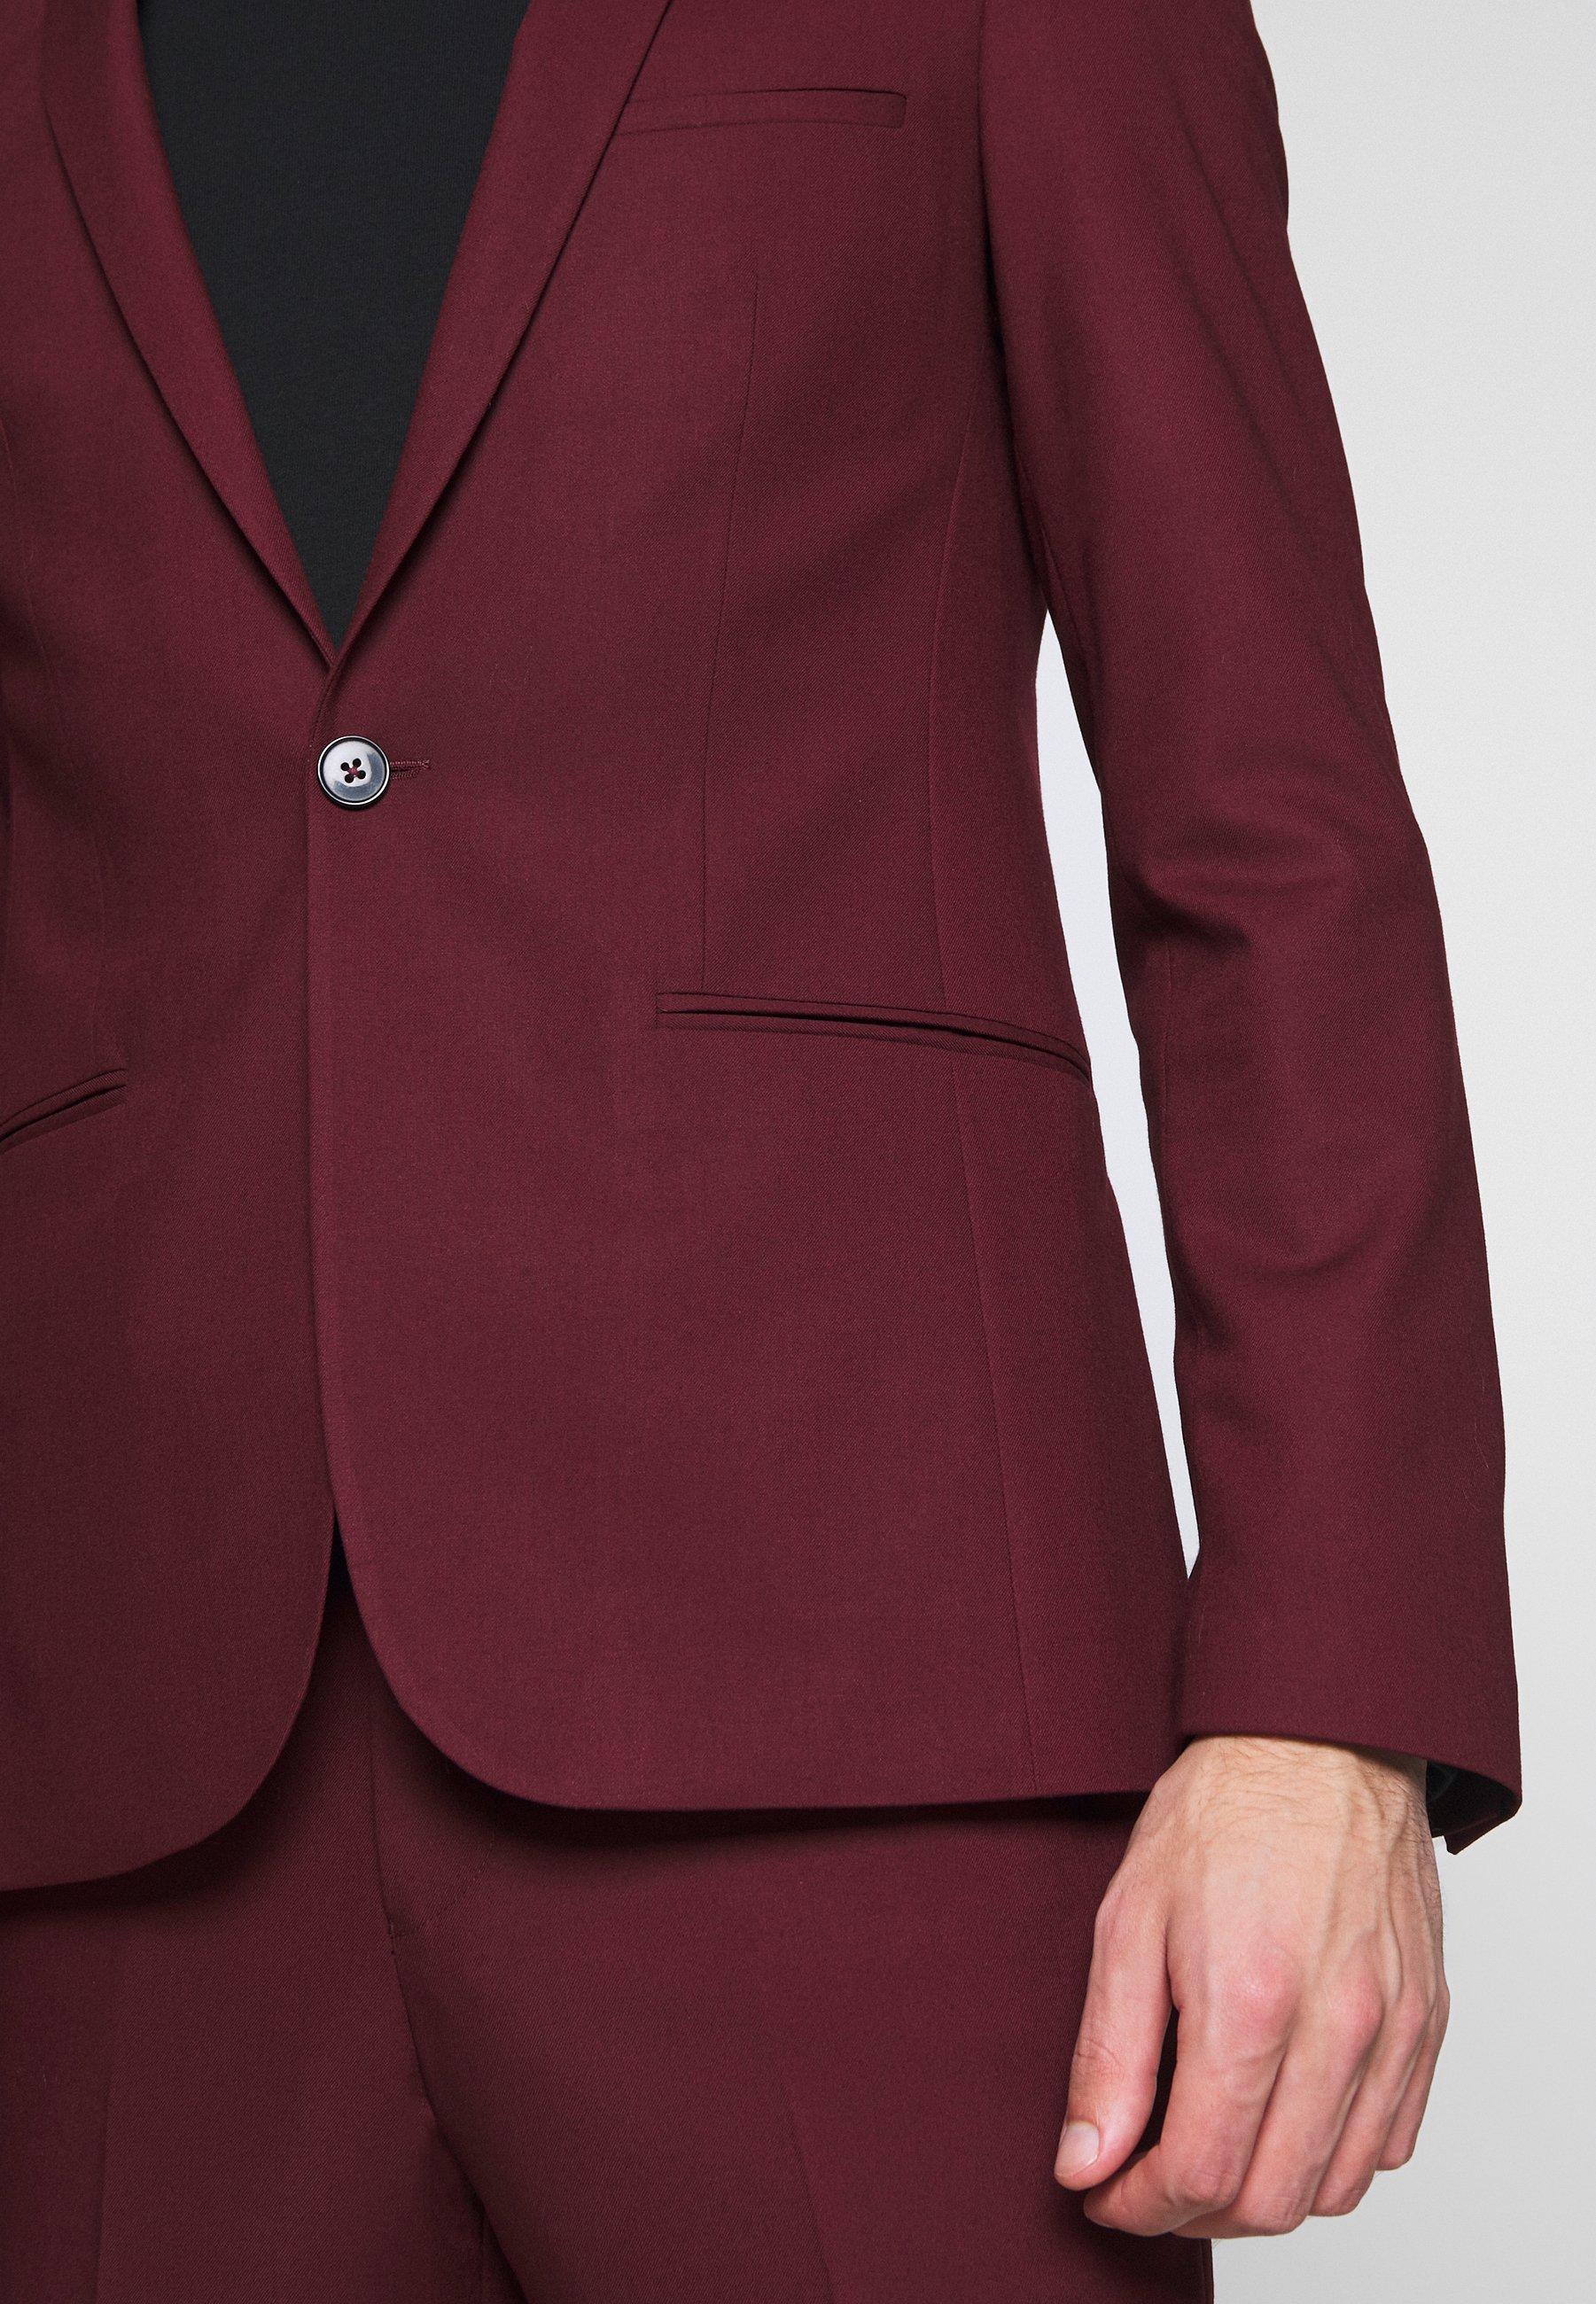 Viggo New Gothenburg Suit - Traje Port